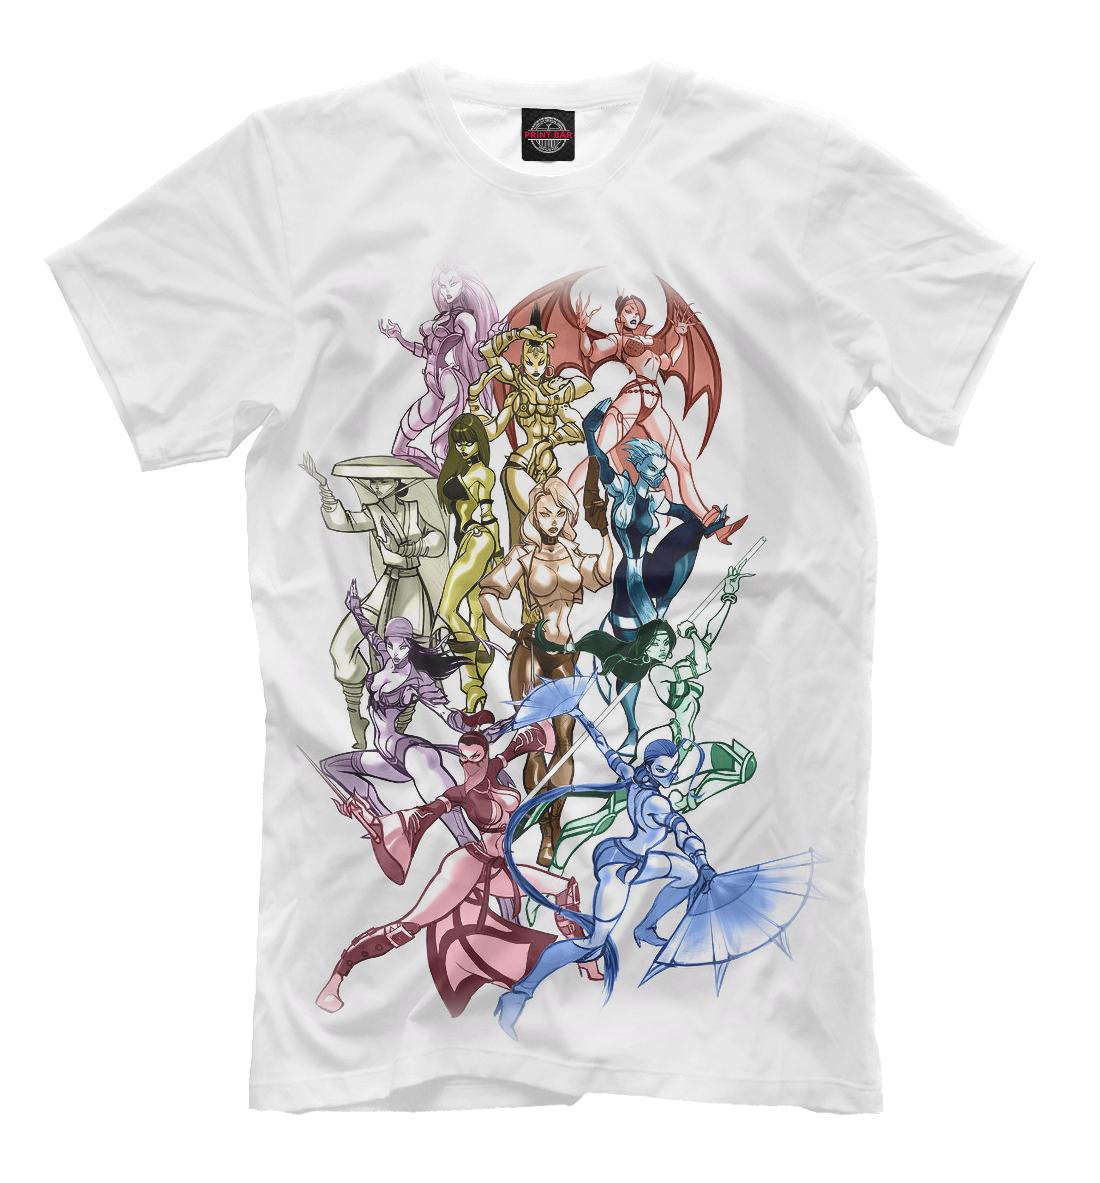 Купить Mortal Kombat Girls, Printbar, Футболки, MKB-442594-fut-2